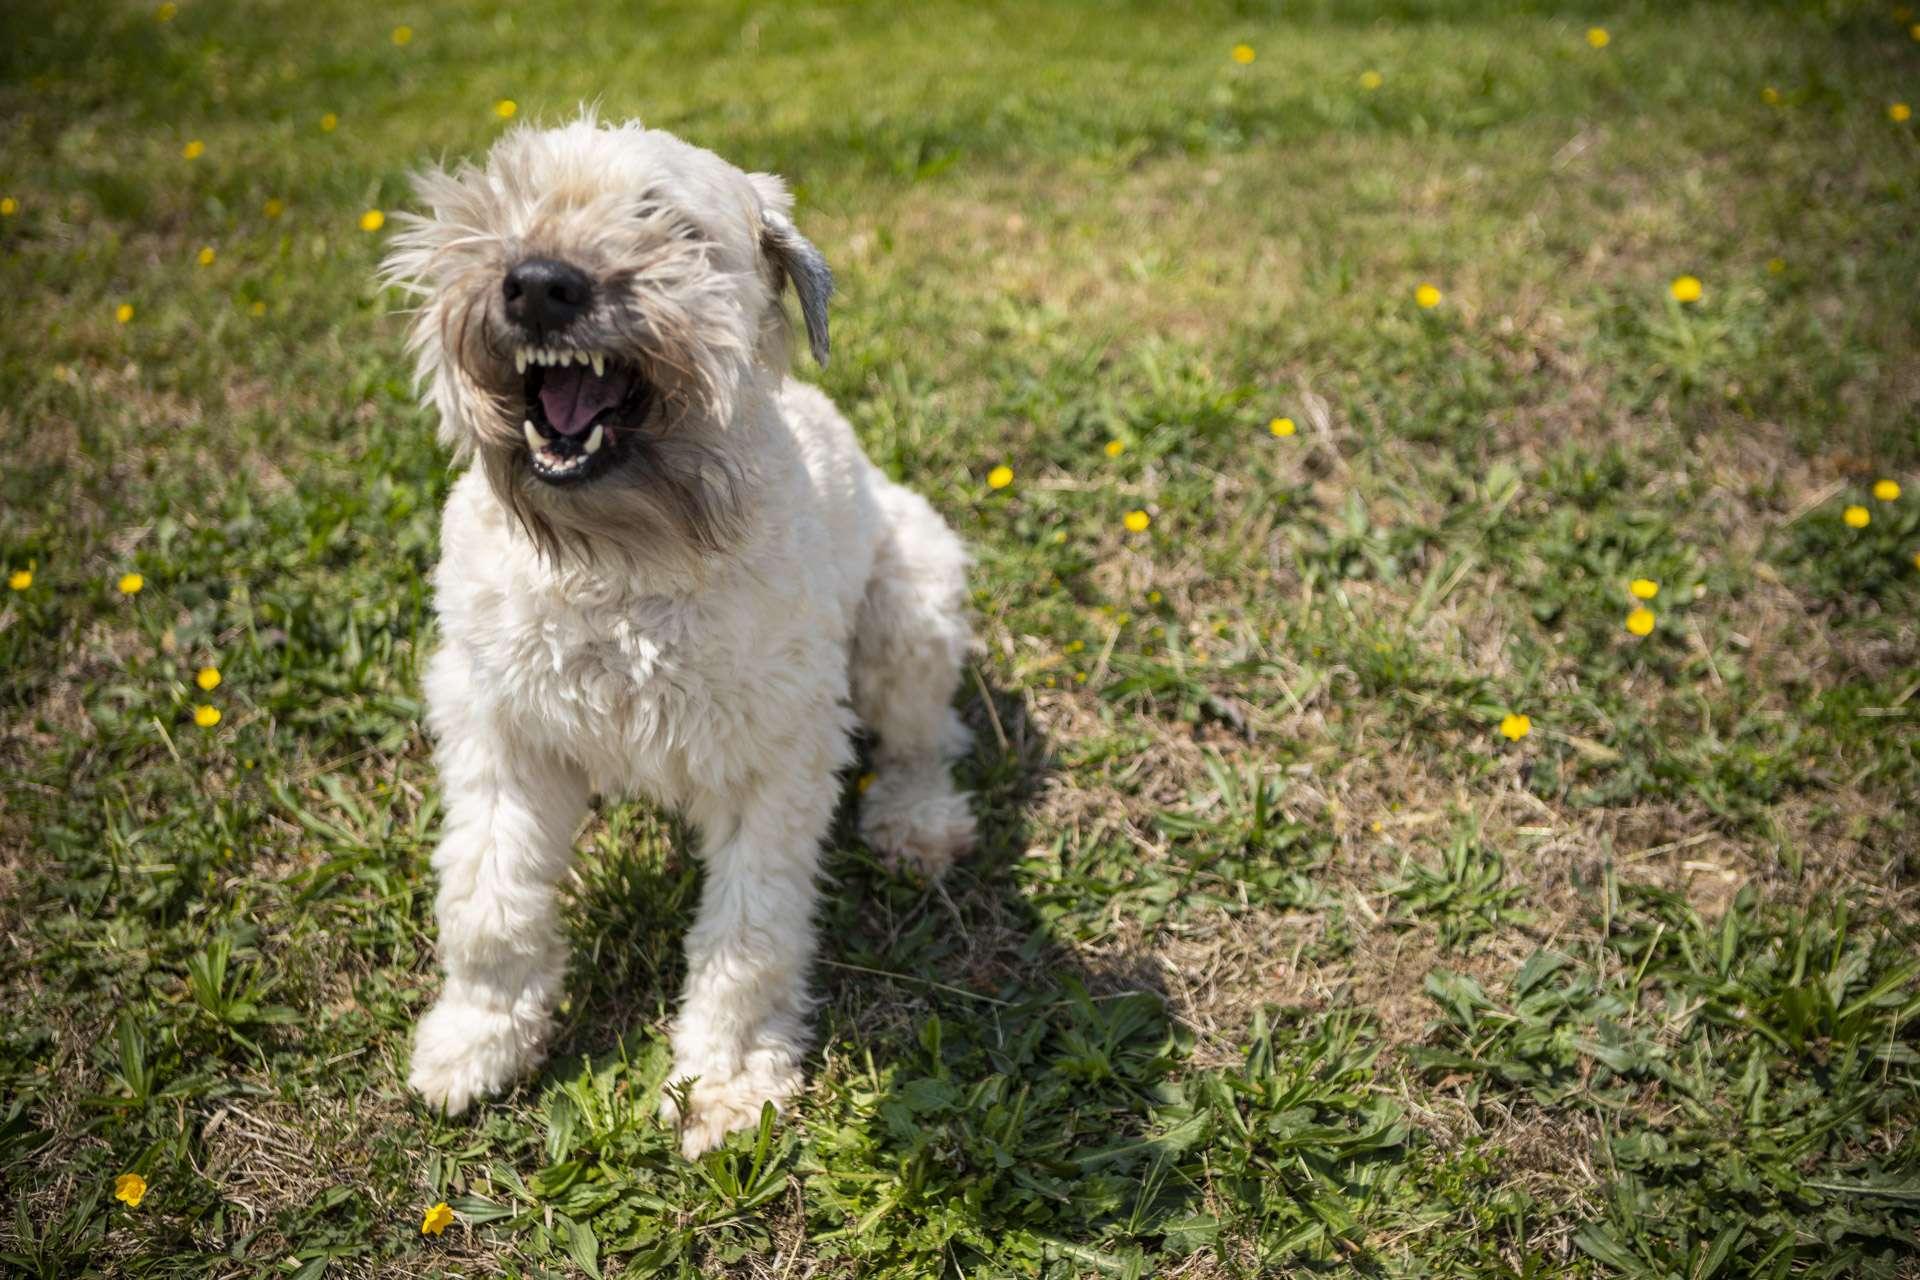 lawn-weeds-dog-3